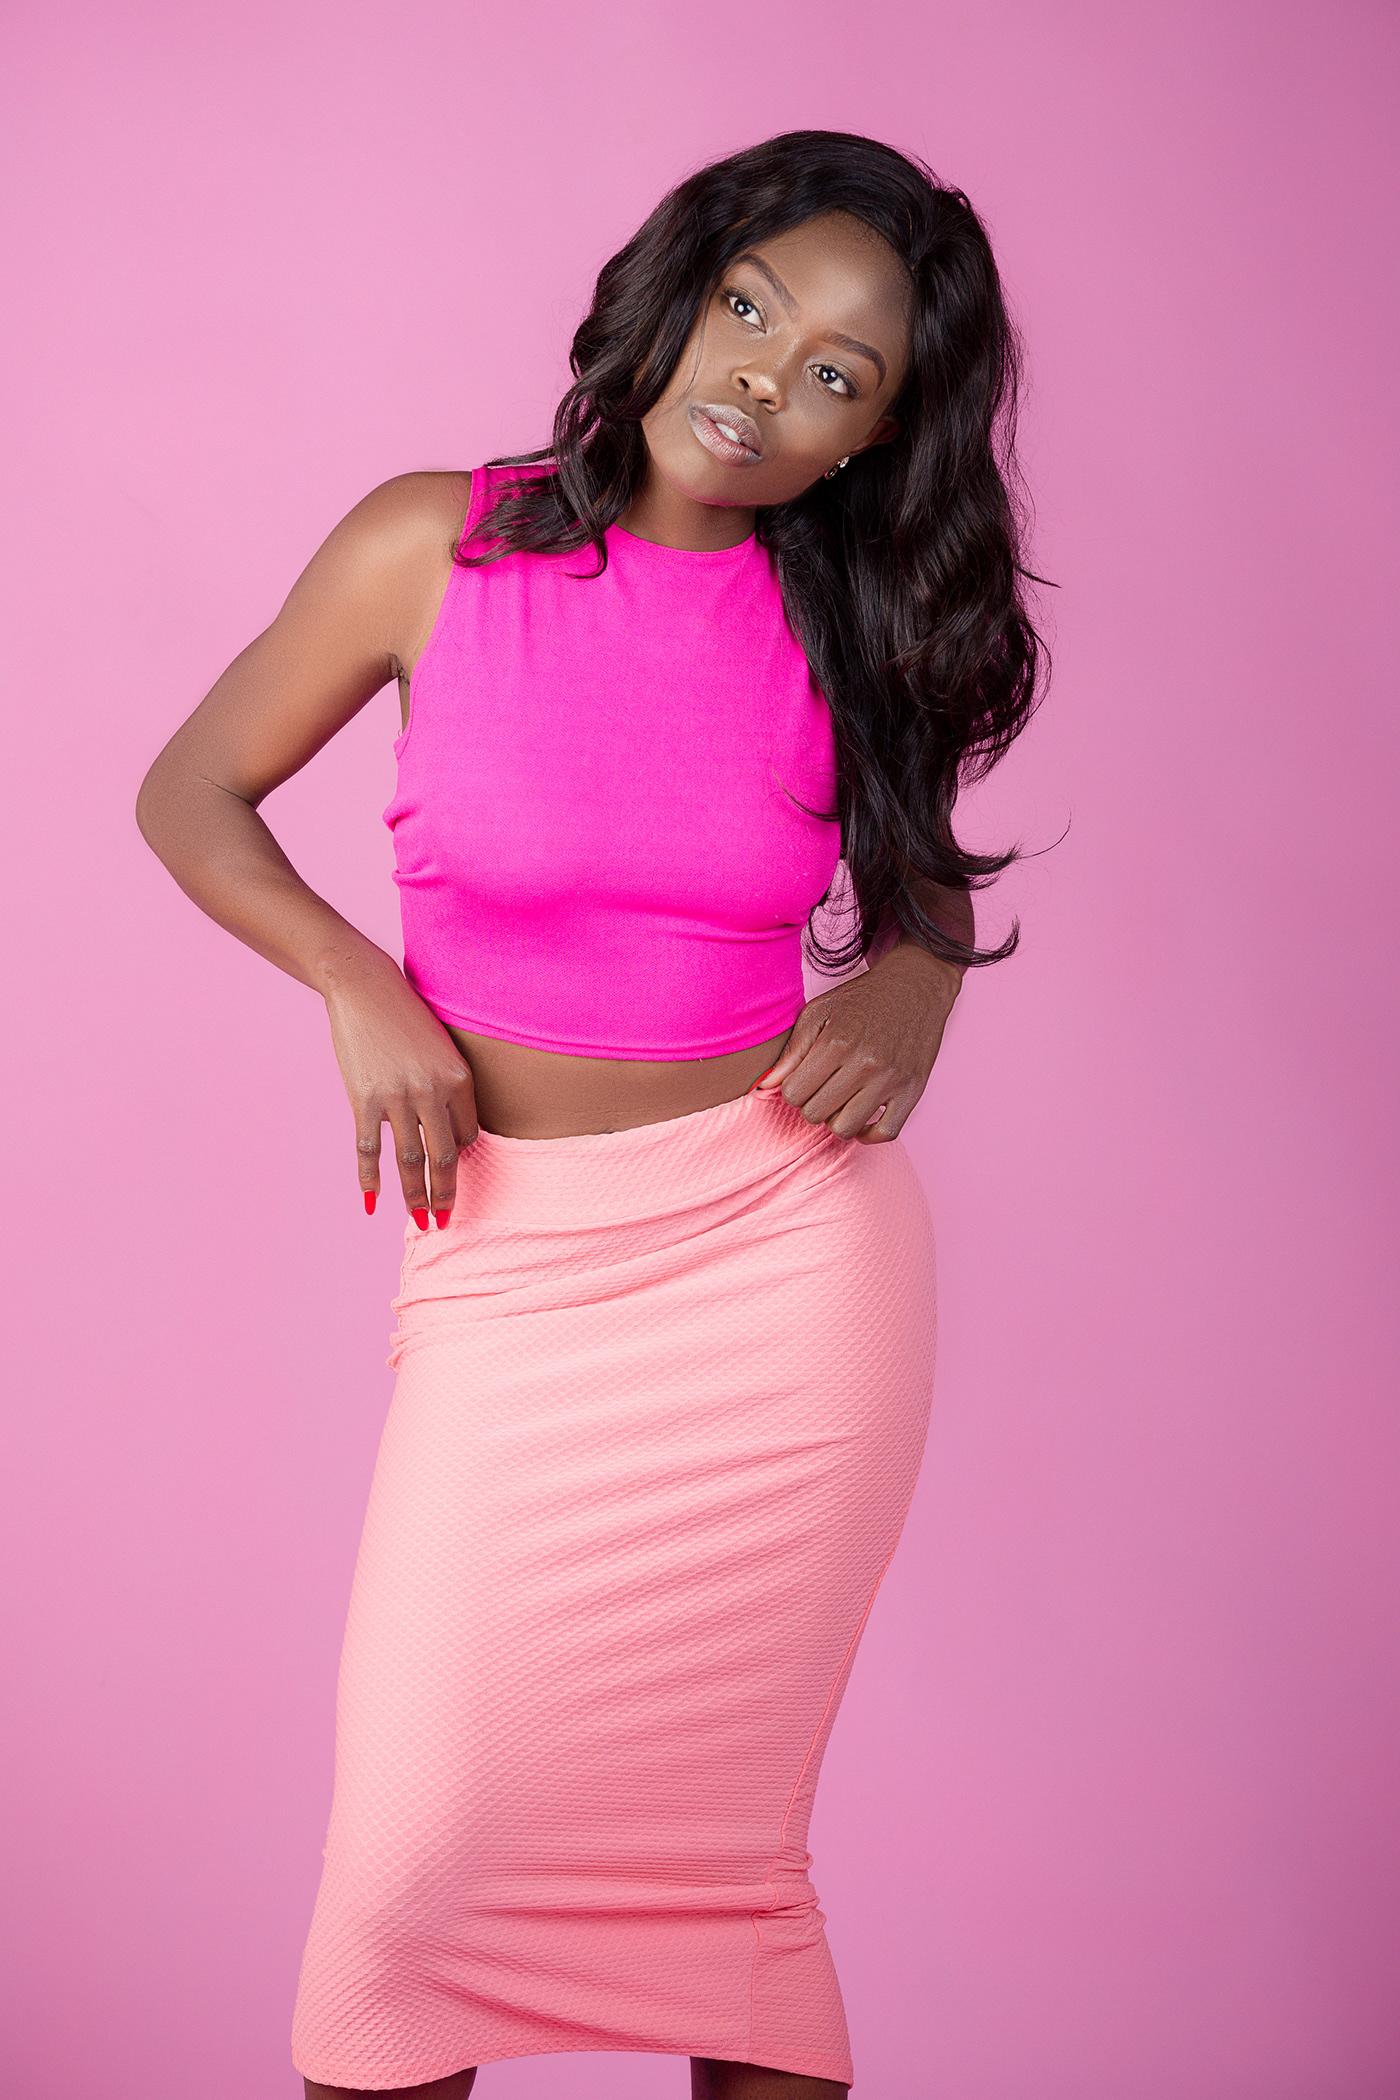 Fashion  Photography  retouch retouchers models MAKE UP ARTIST female models Kenya Fashion  fashion photographers portraits